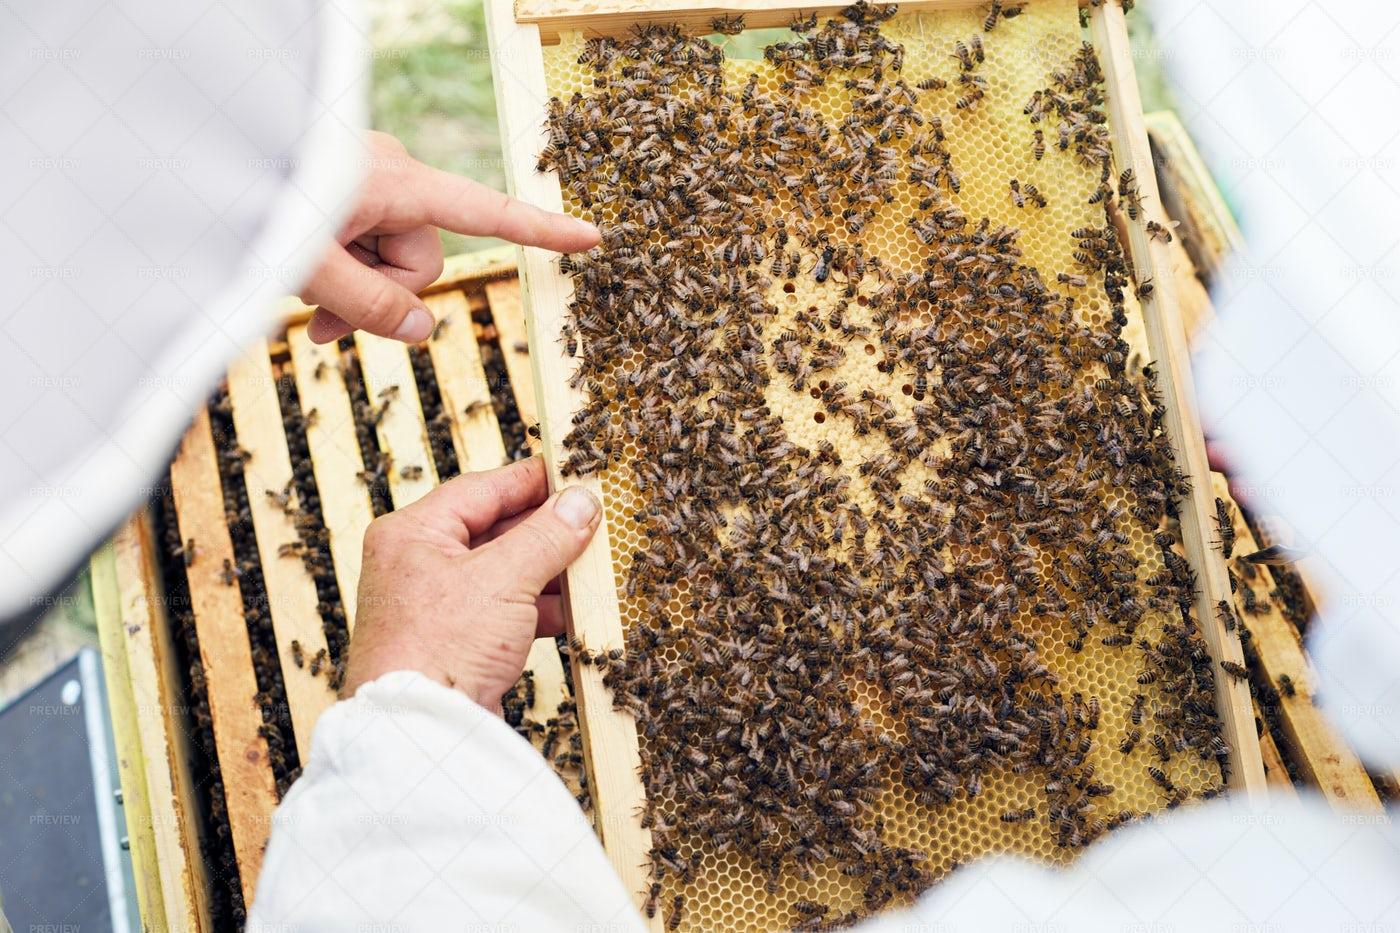 Beekeepers Examining Hive: Stock Photos